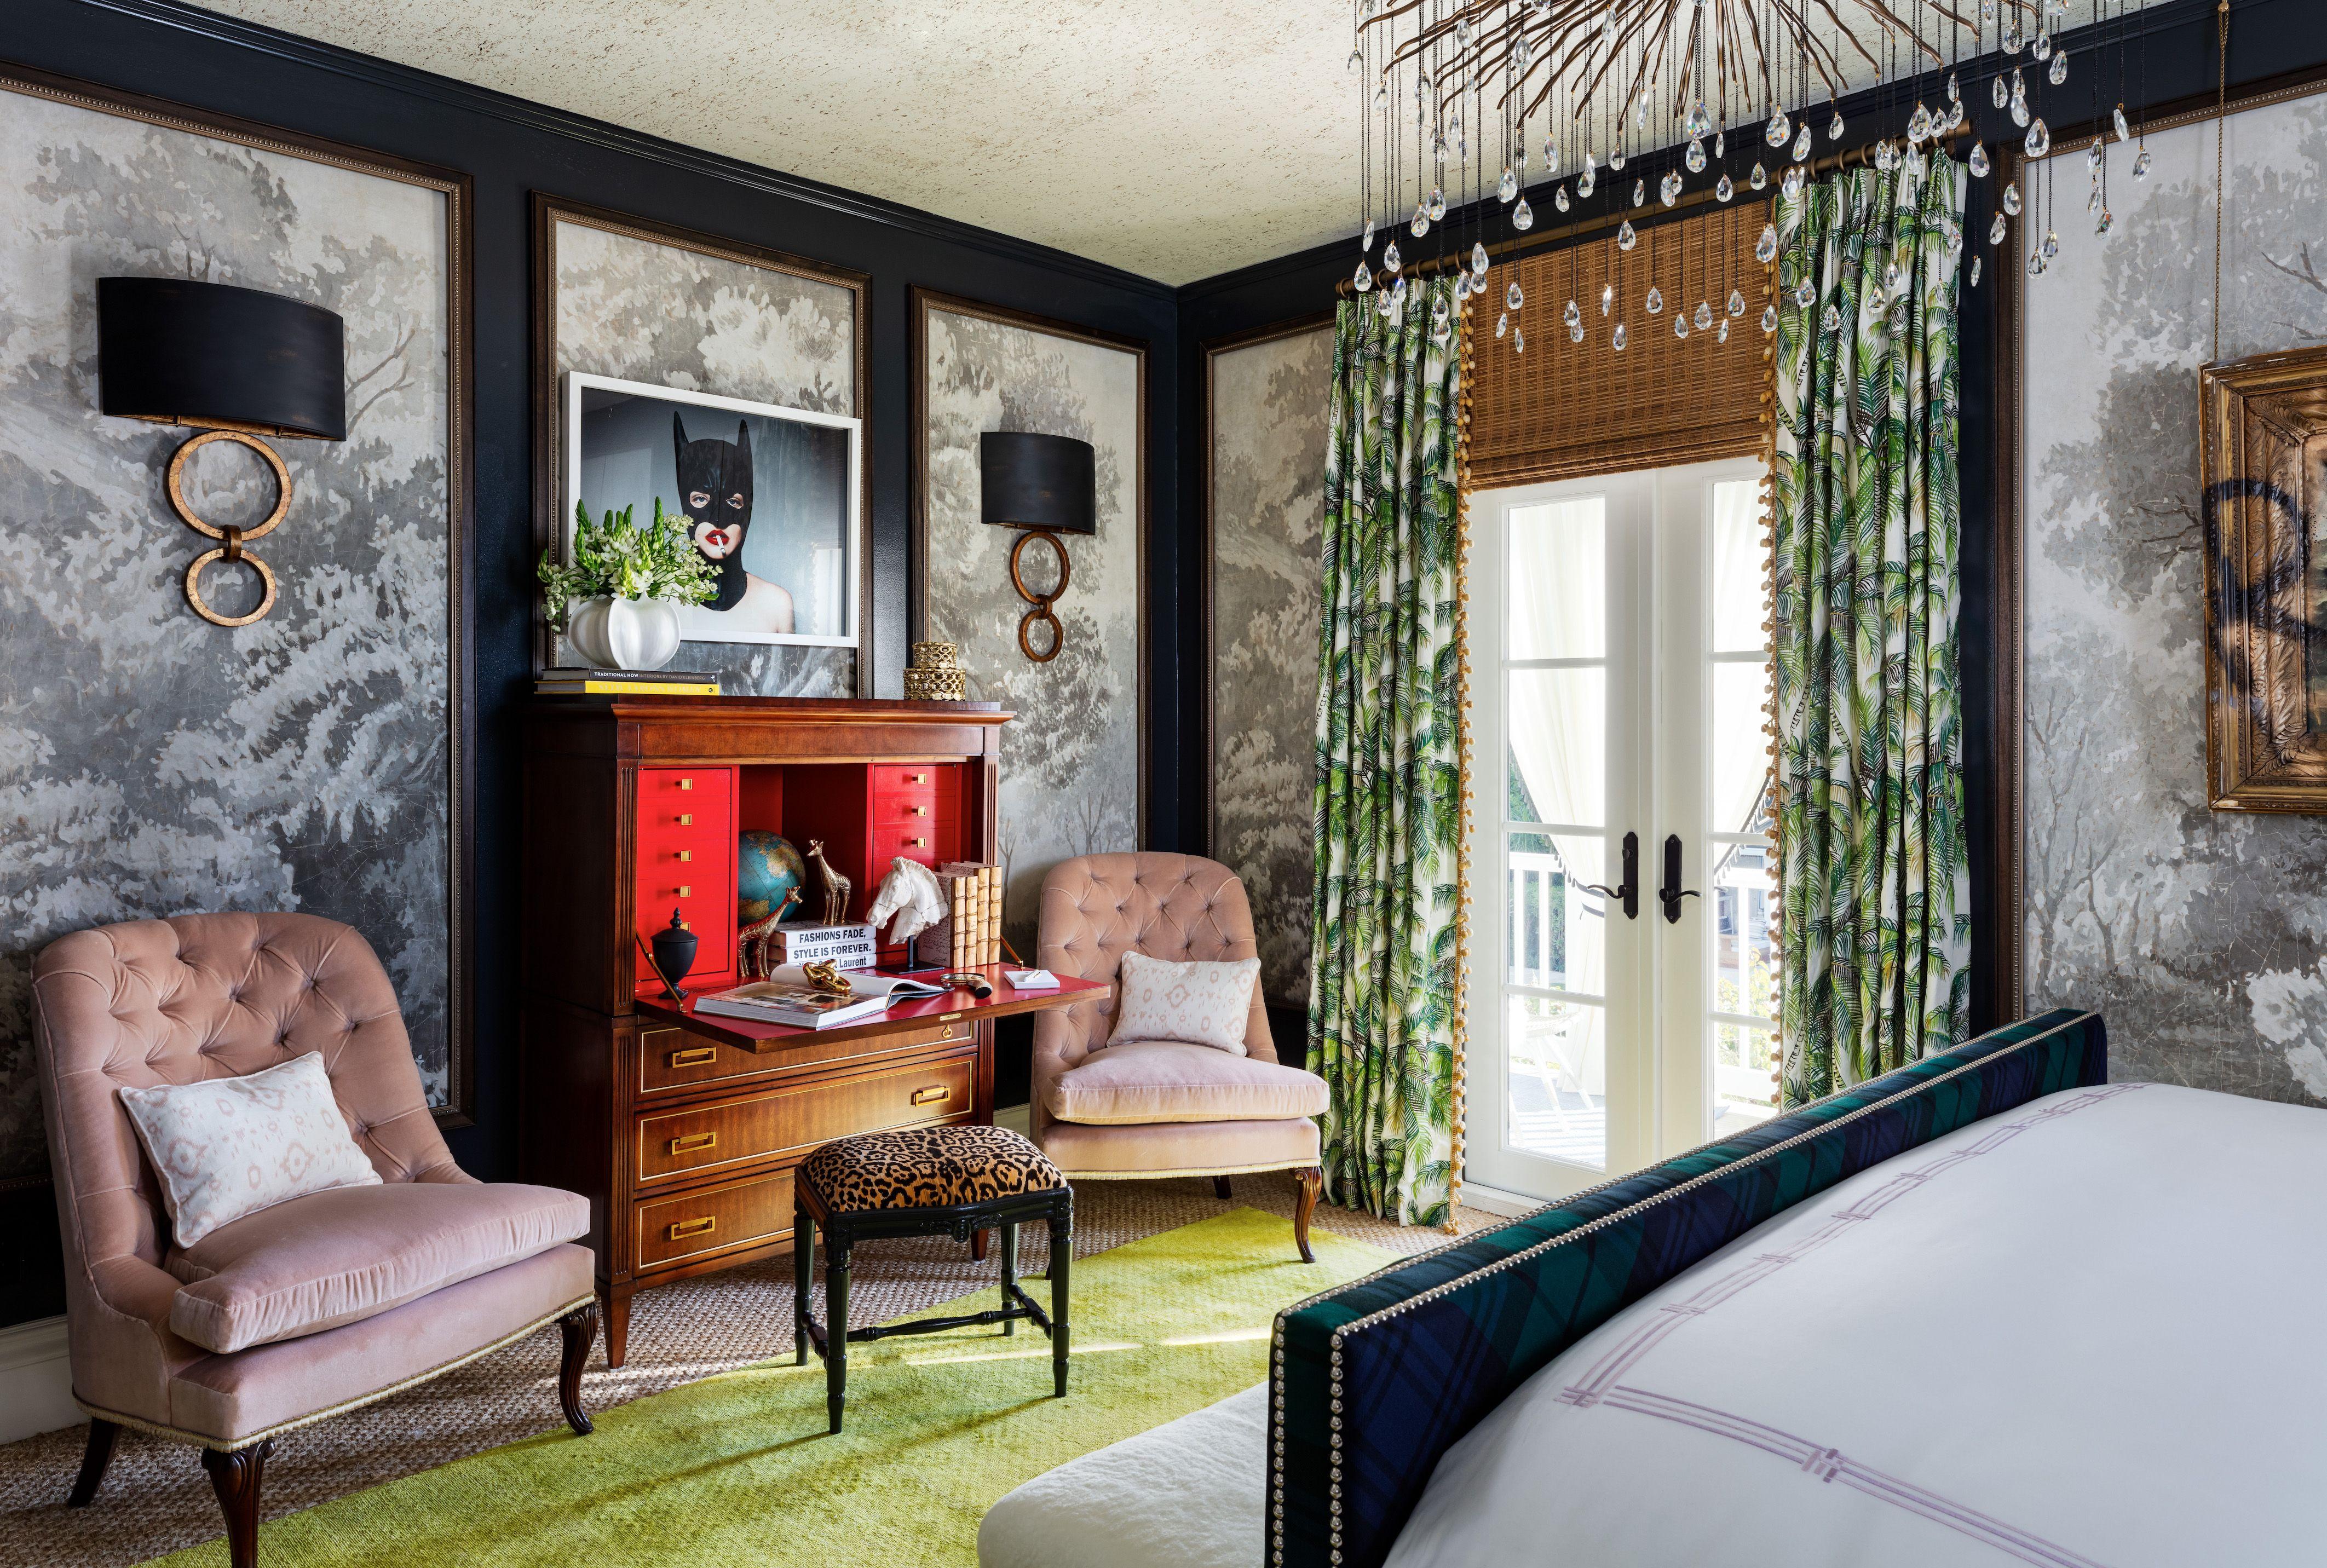 12 Best Window Treatment Ideas Modern Curtain And Shade Ideas